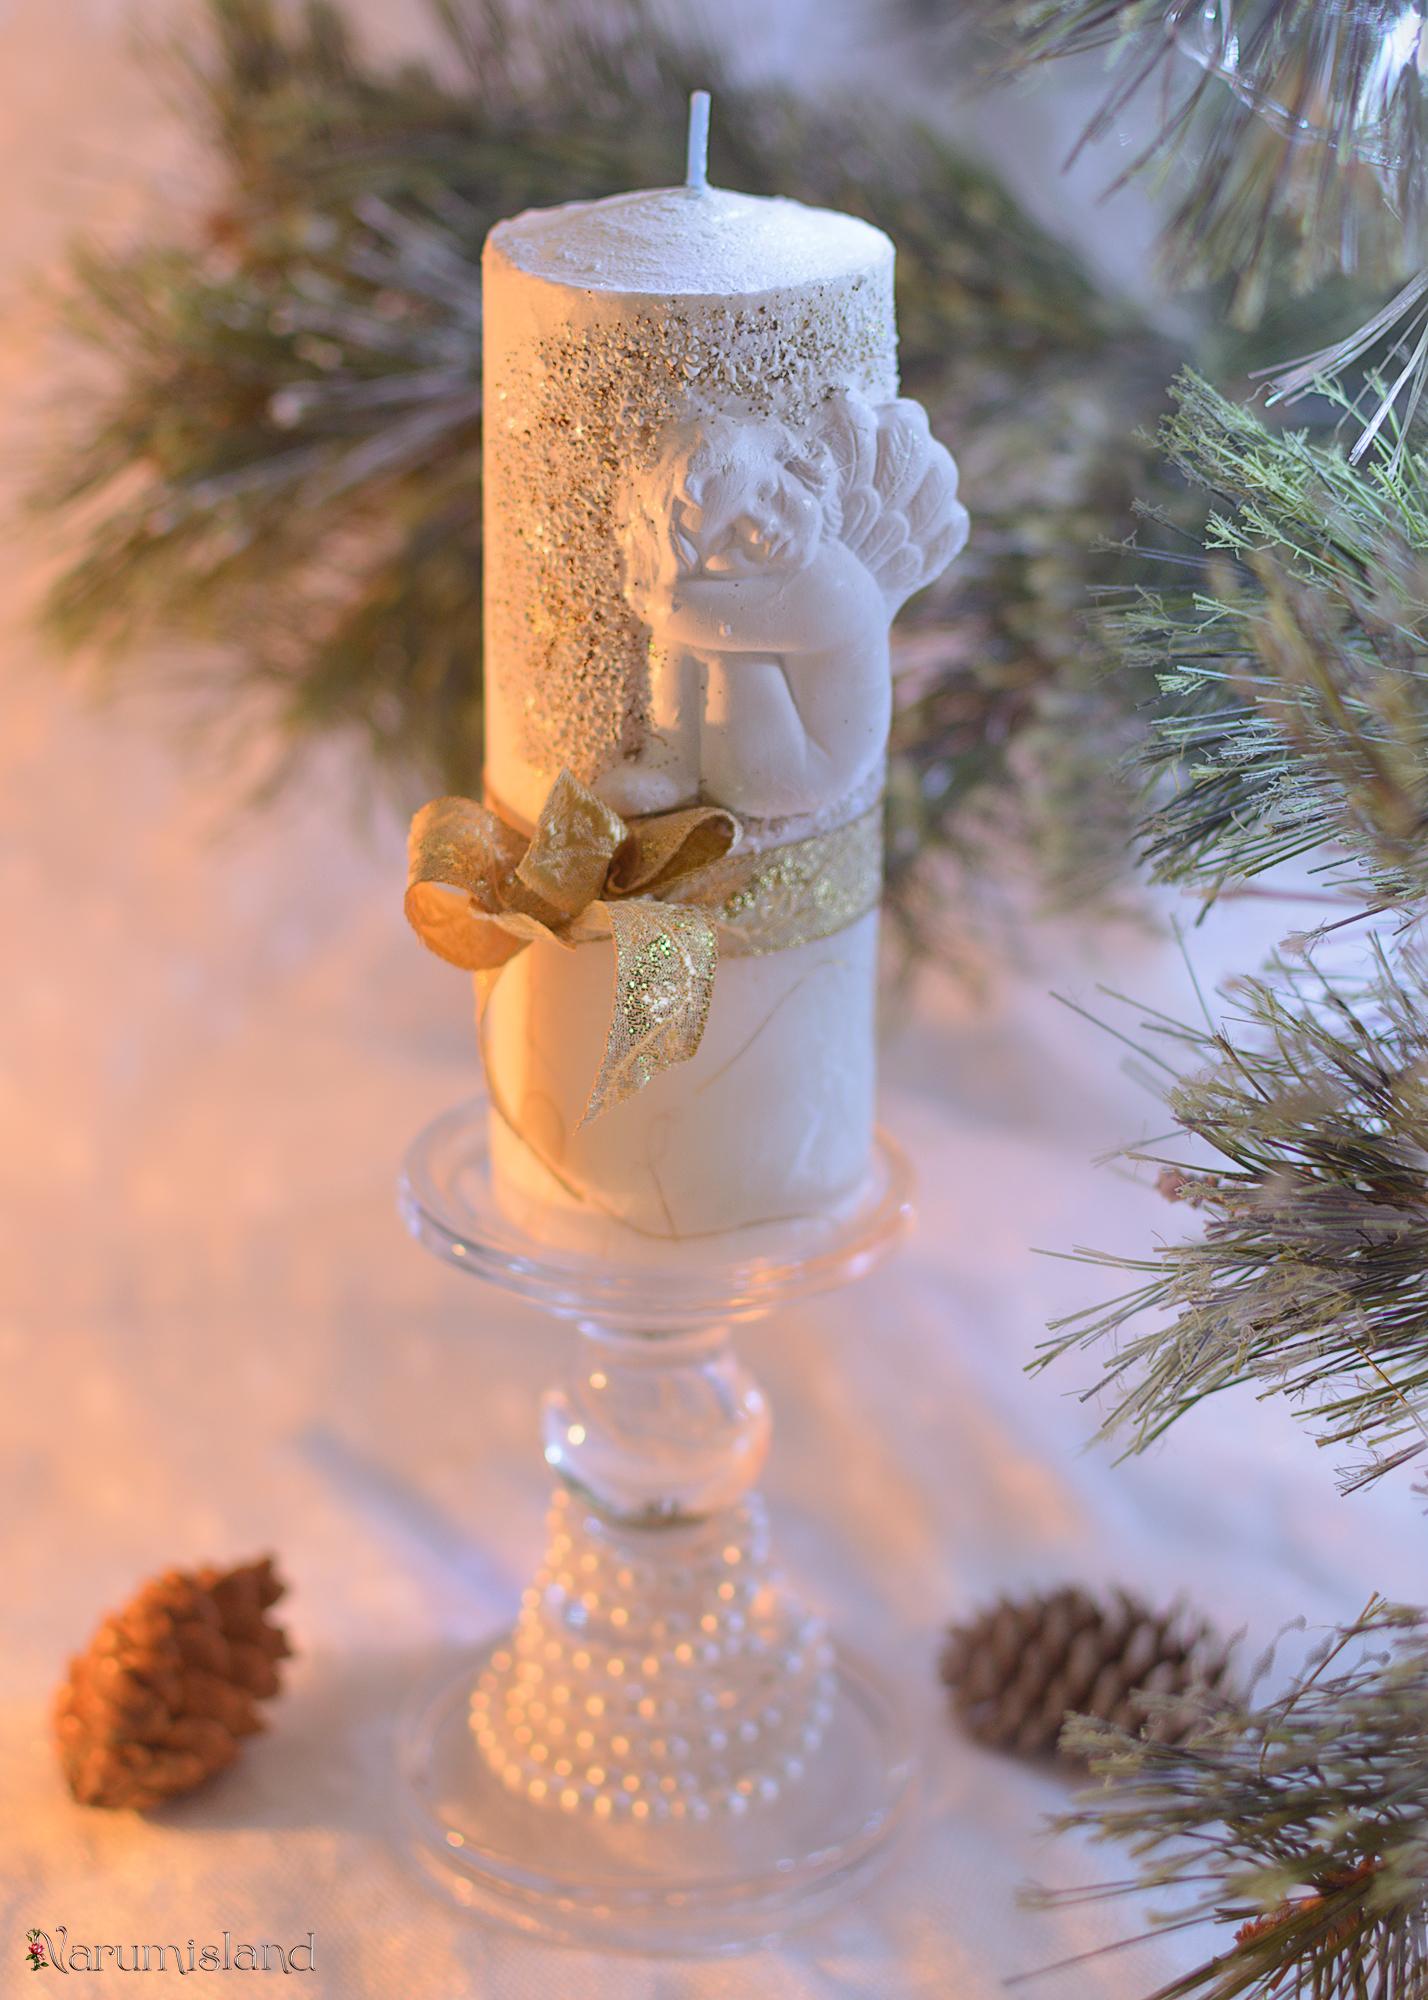 Handmade, Funda Aurie, Glittere Si Ingeras 3D